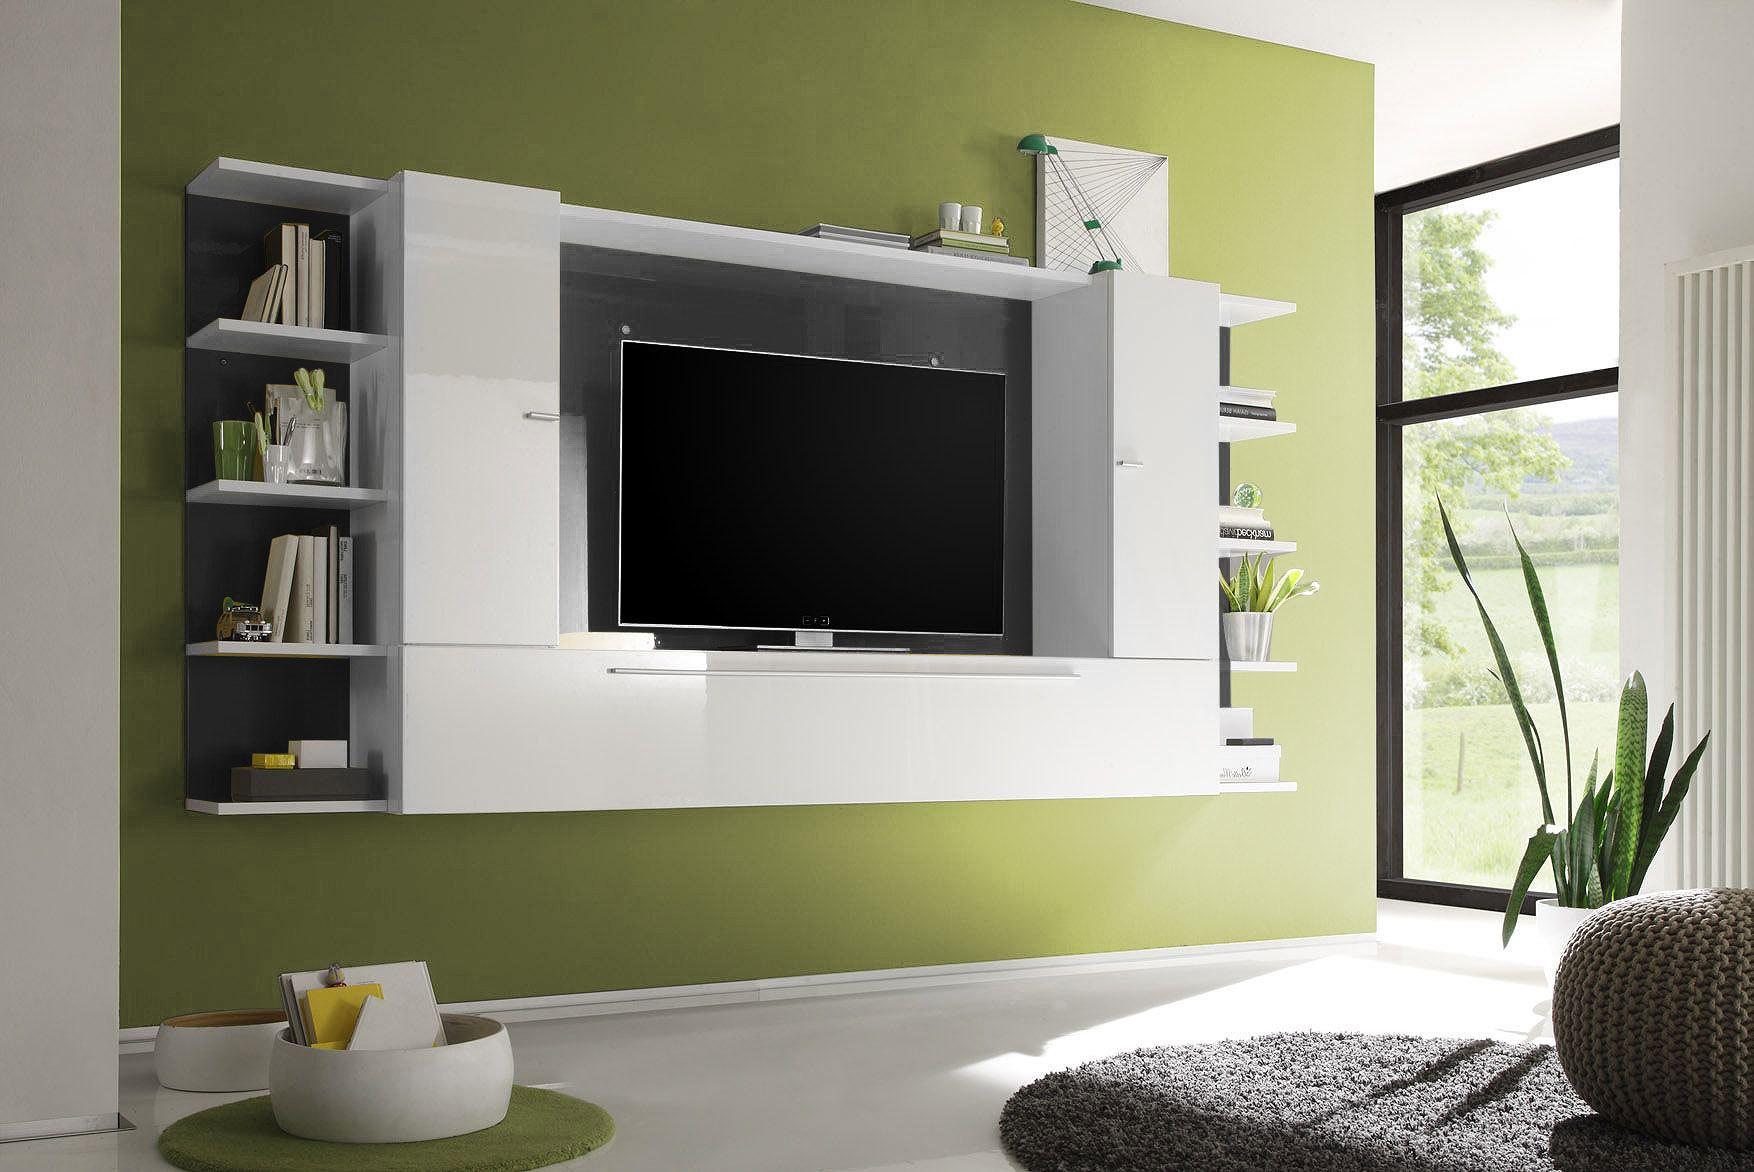 Meuble Tv Mural Blanc Et Gris Luvenia Artzein Com # Meuble Tv Nexus